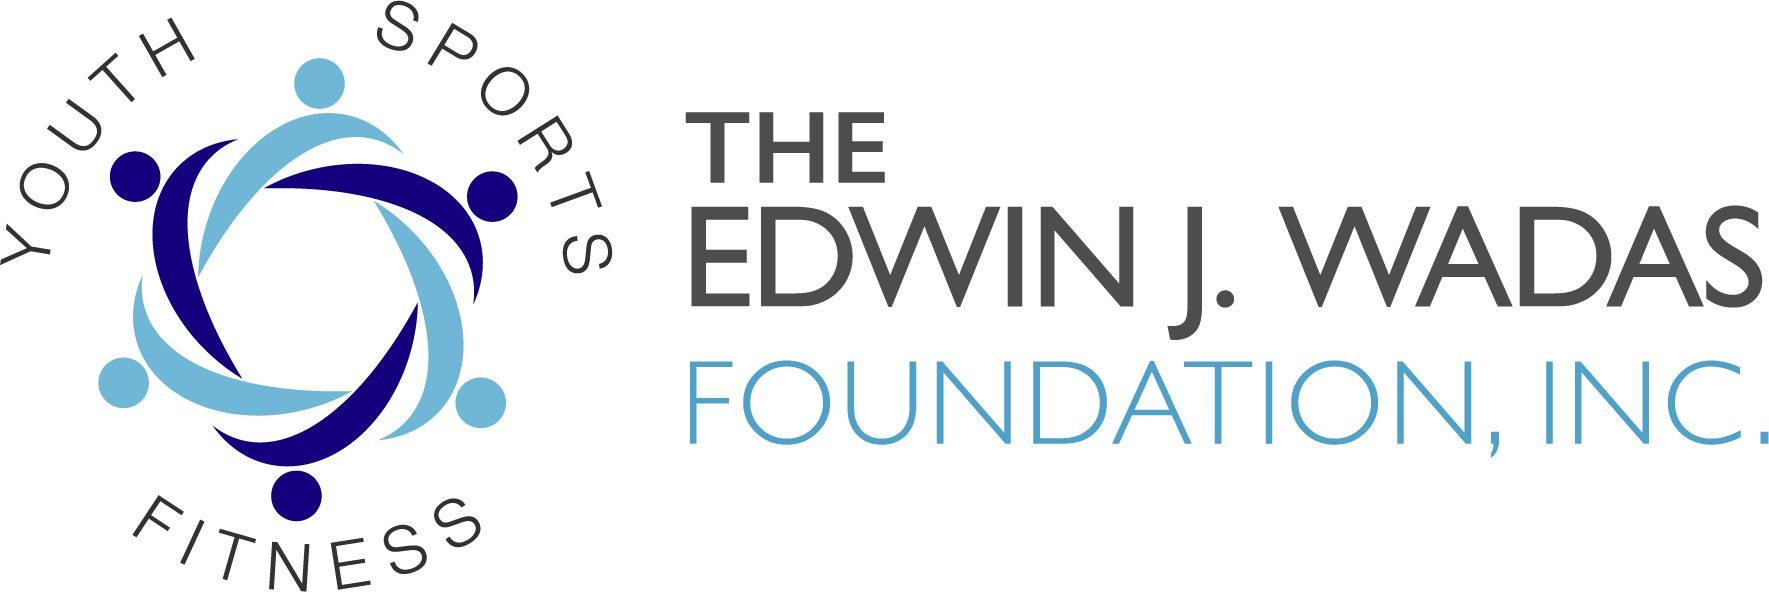 Wadas Foundation Logo